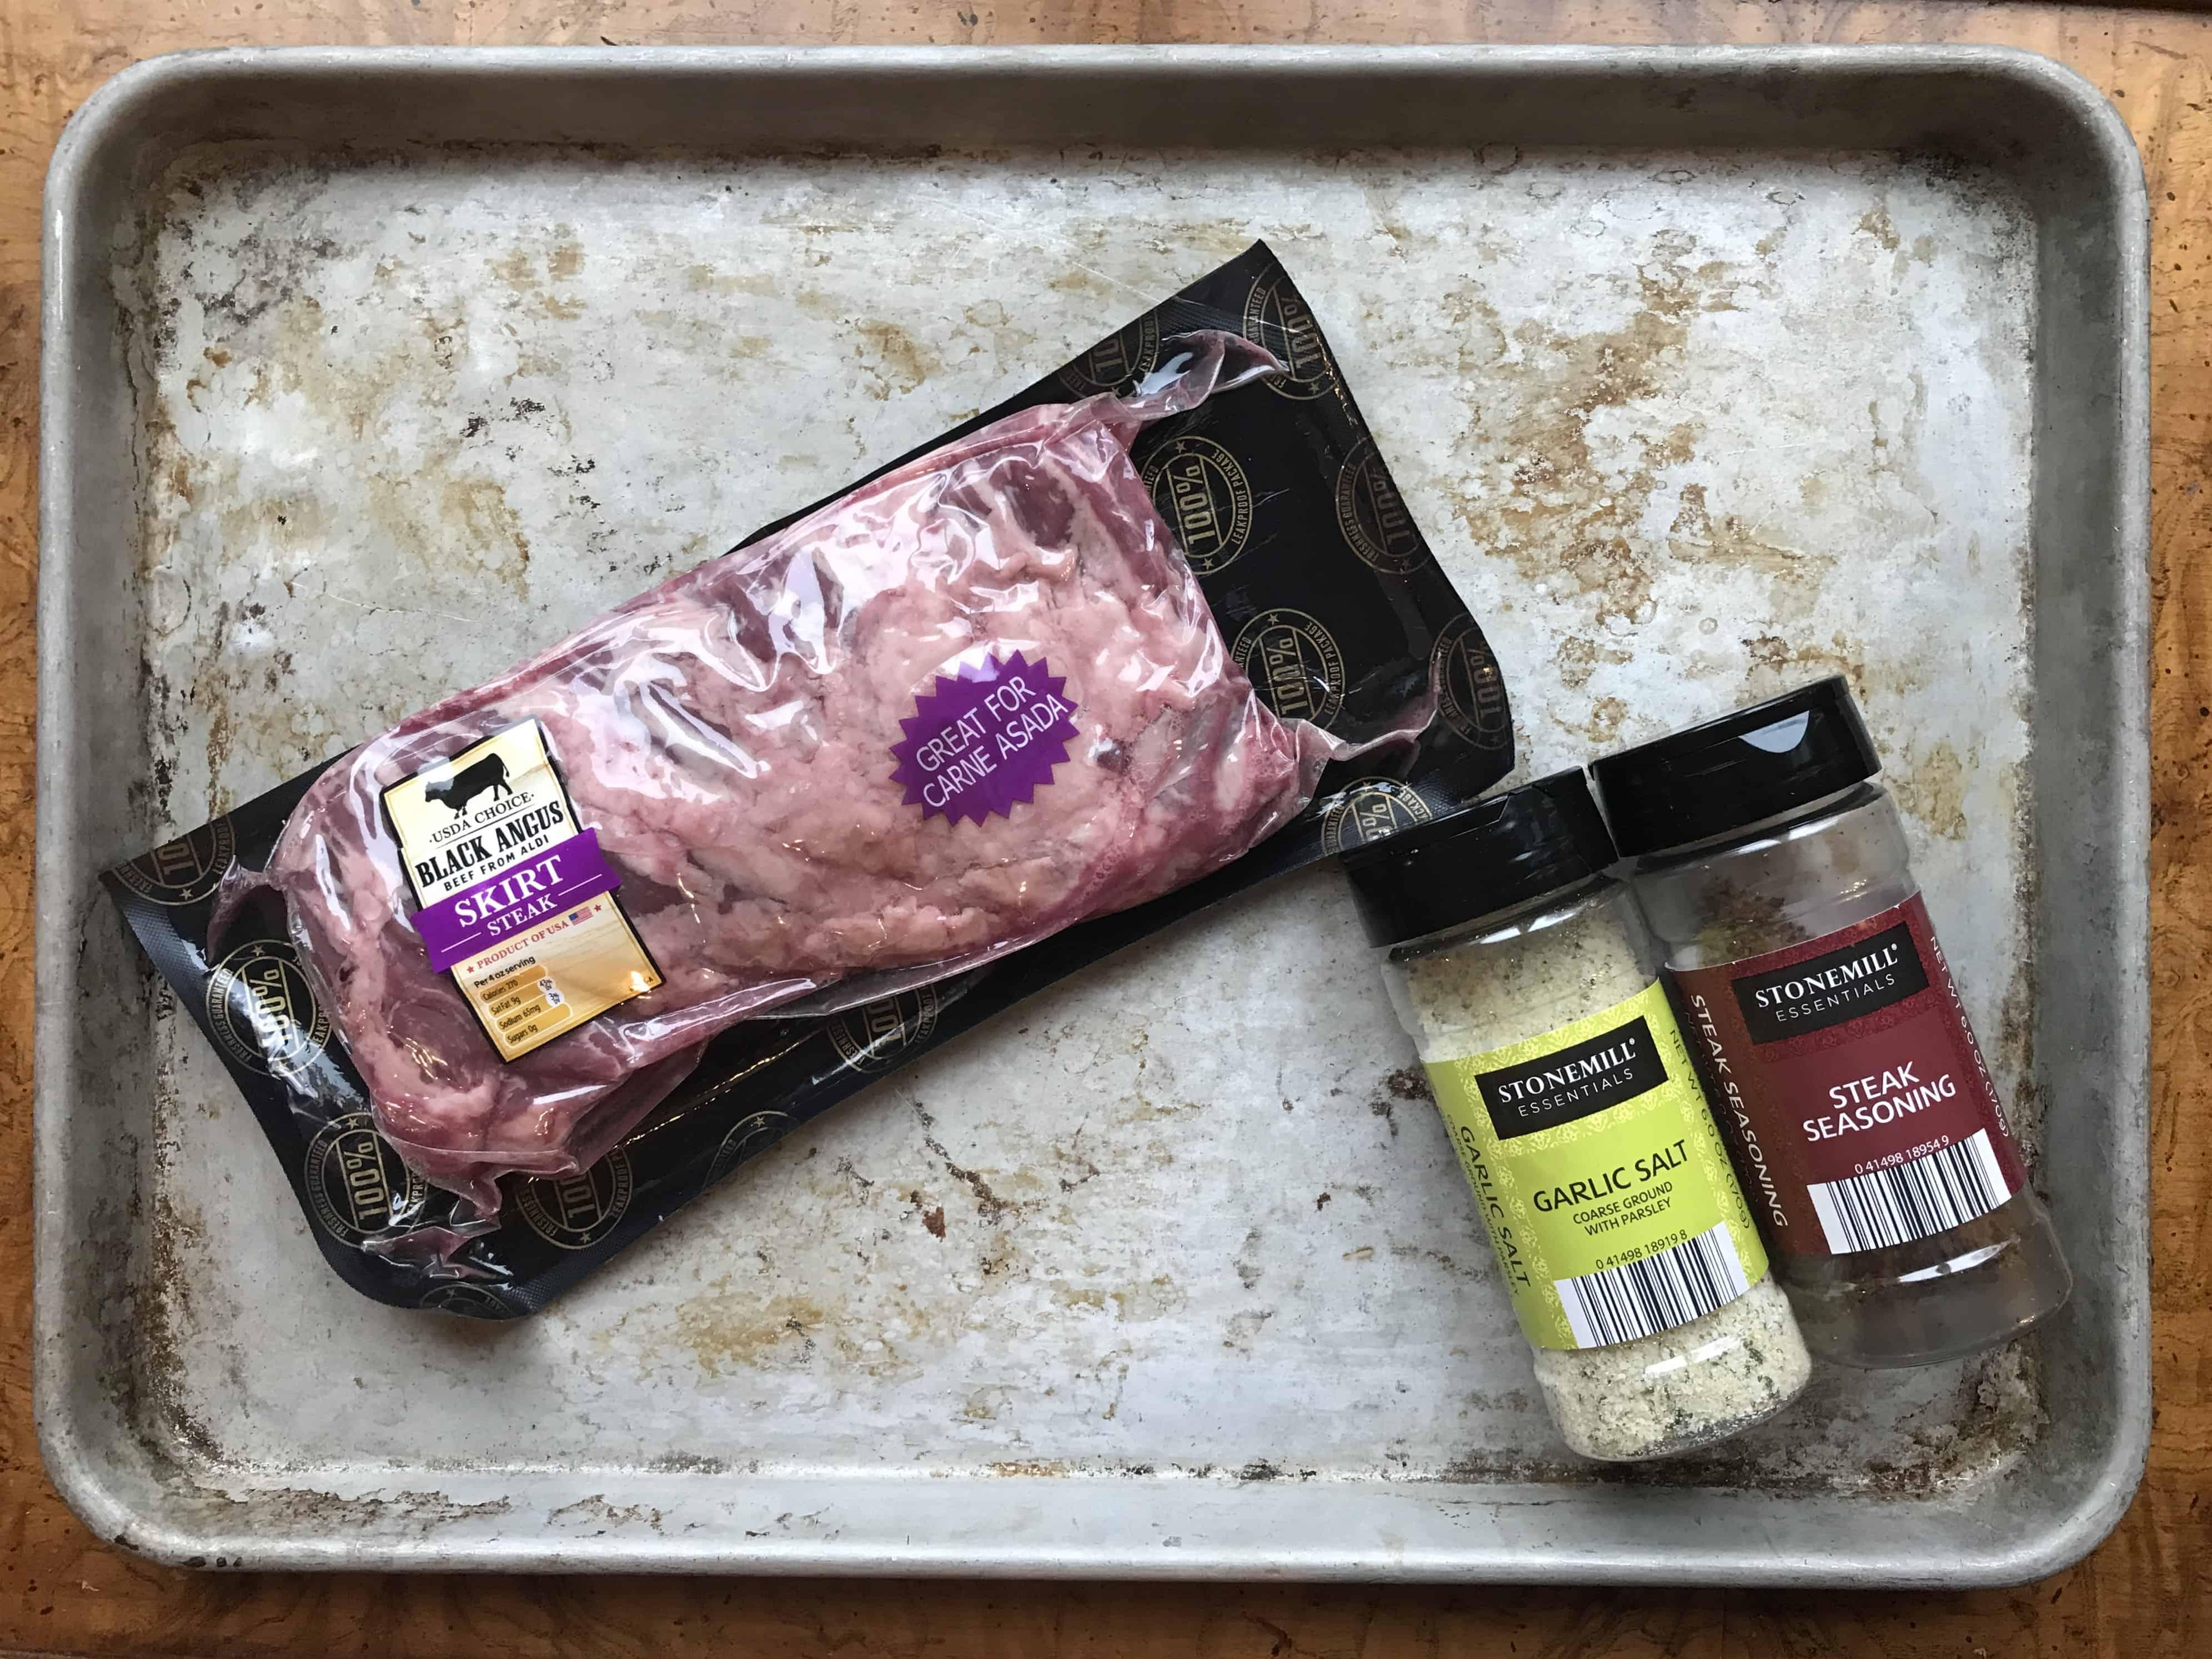 Thai Steak Salad ingredients of skirt steak, garlic salt, and Steak seasoning.